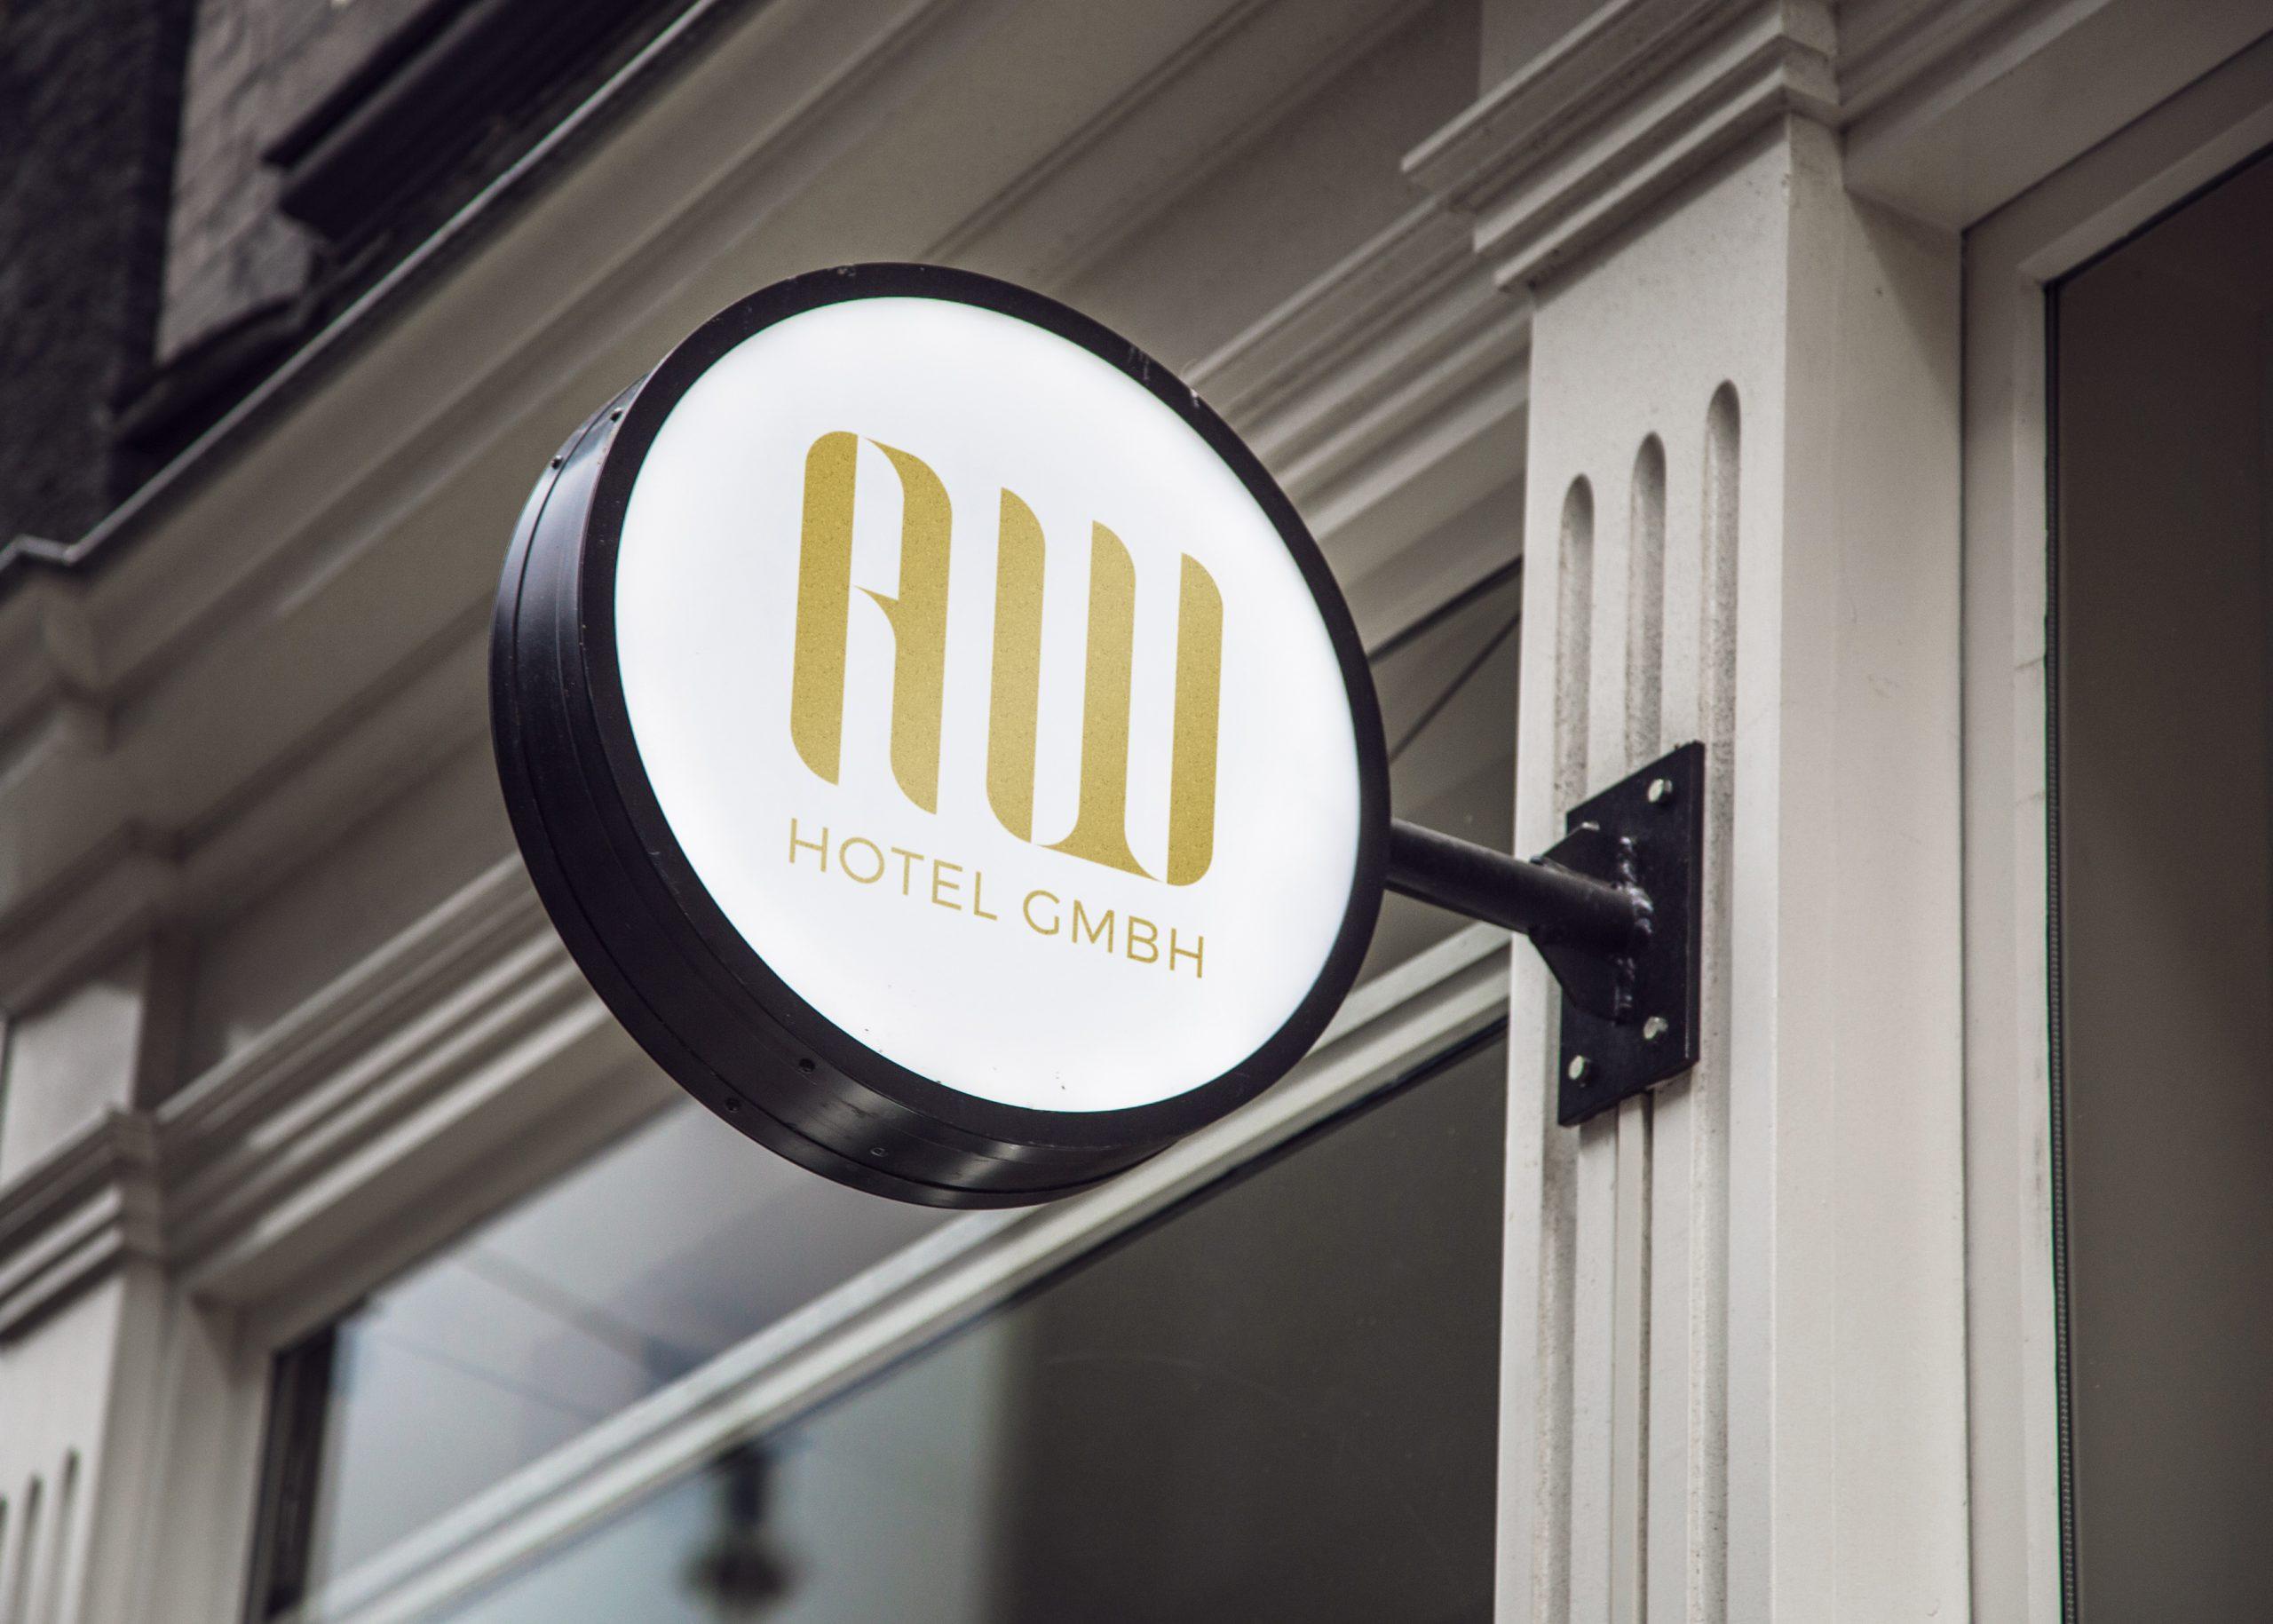 AW Hotel / Logo